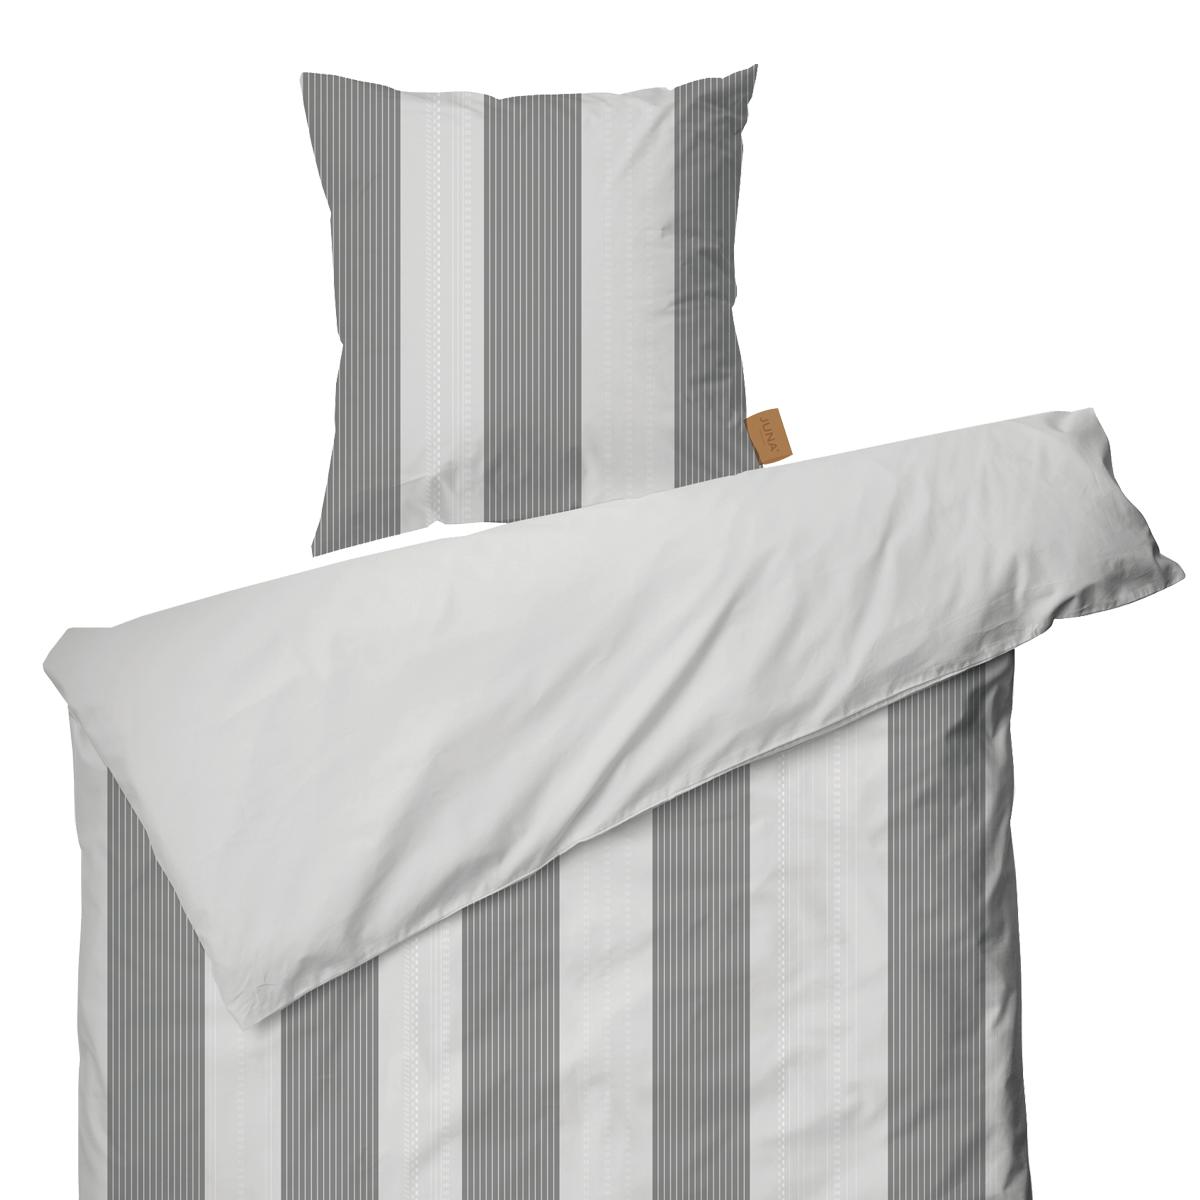 Juna Folded Stripes Sengetøy hvit 140x220 cm  pute 50x70cm